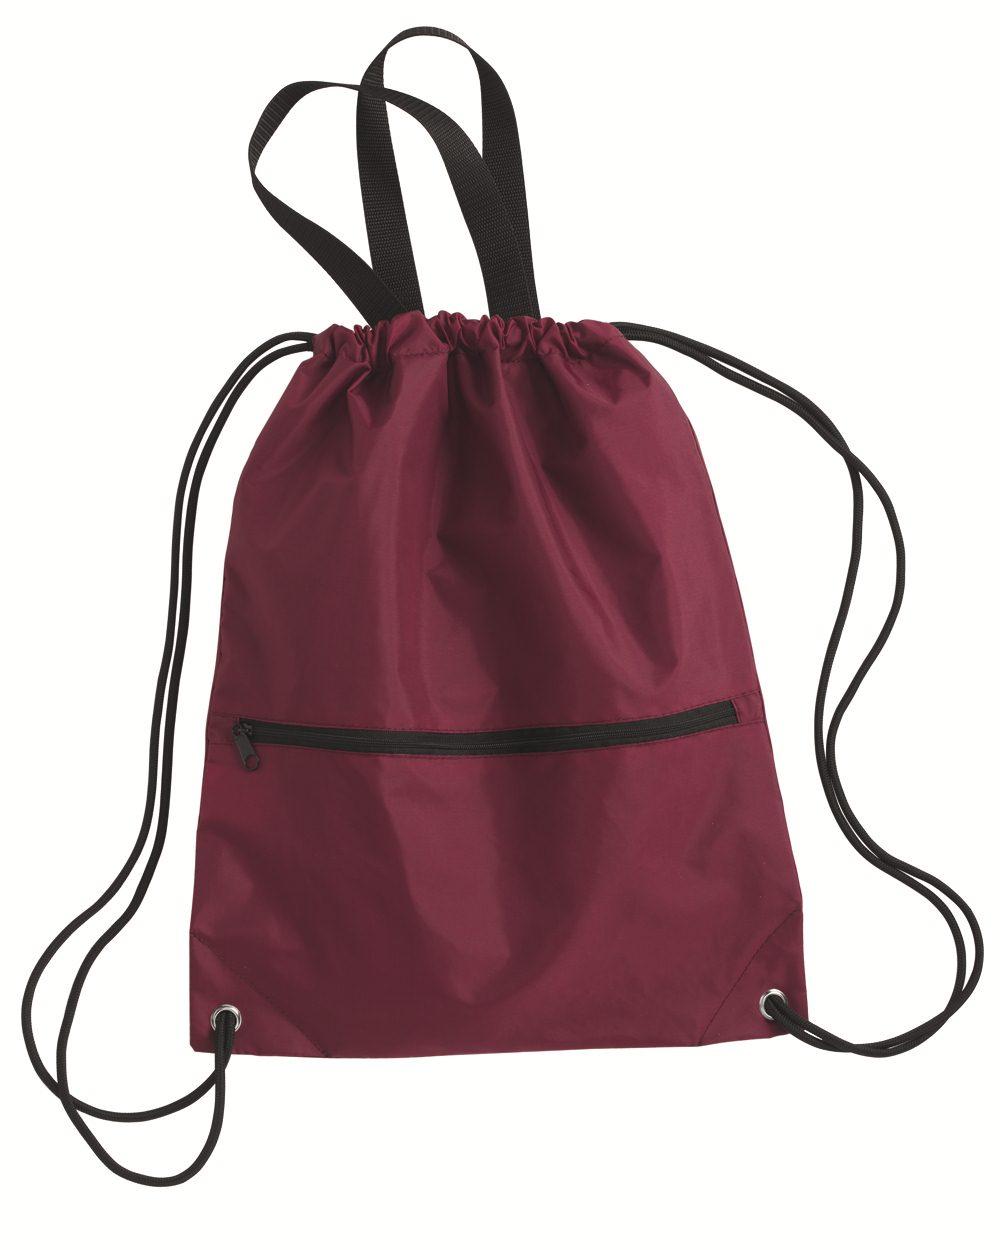 564f7ba42c Augusta Sportswear 511 420-Denier Gear Bag  20.76 - Bags